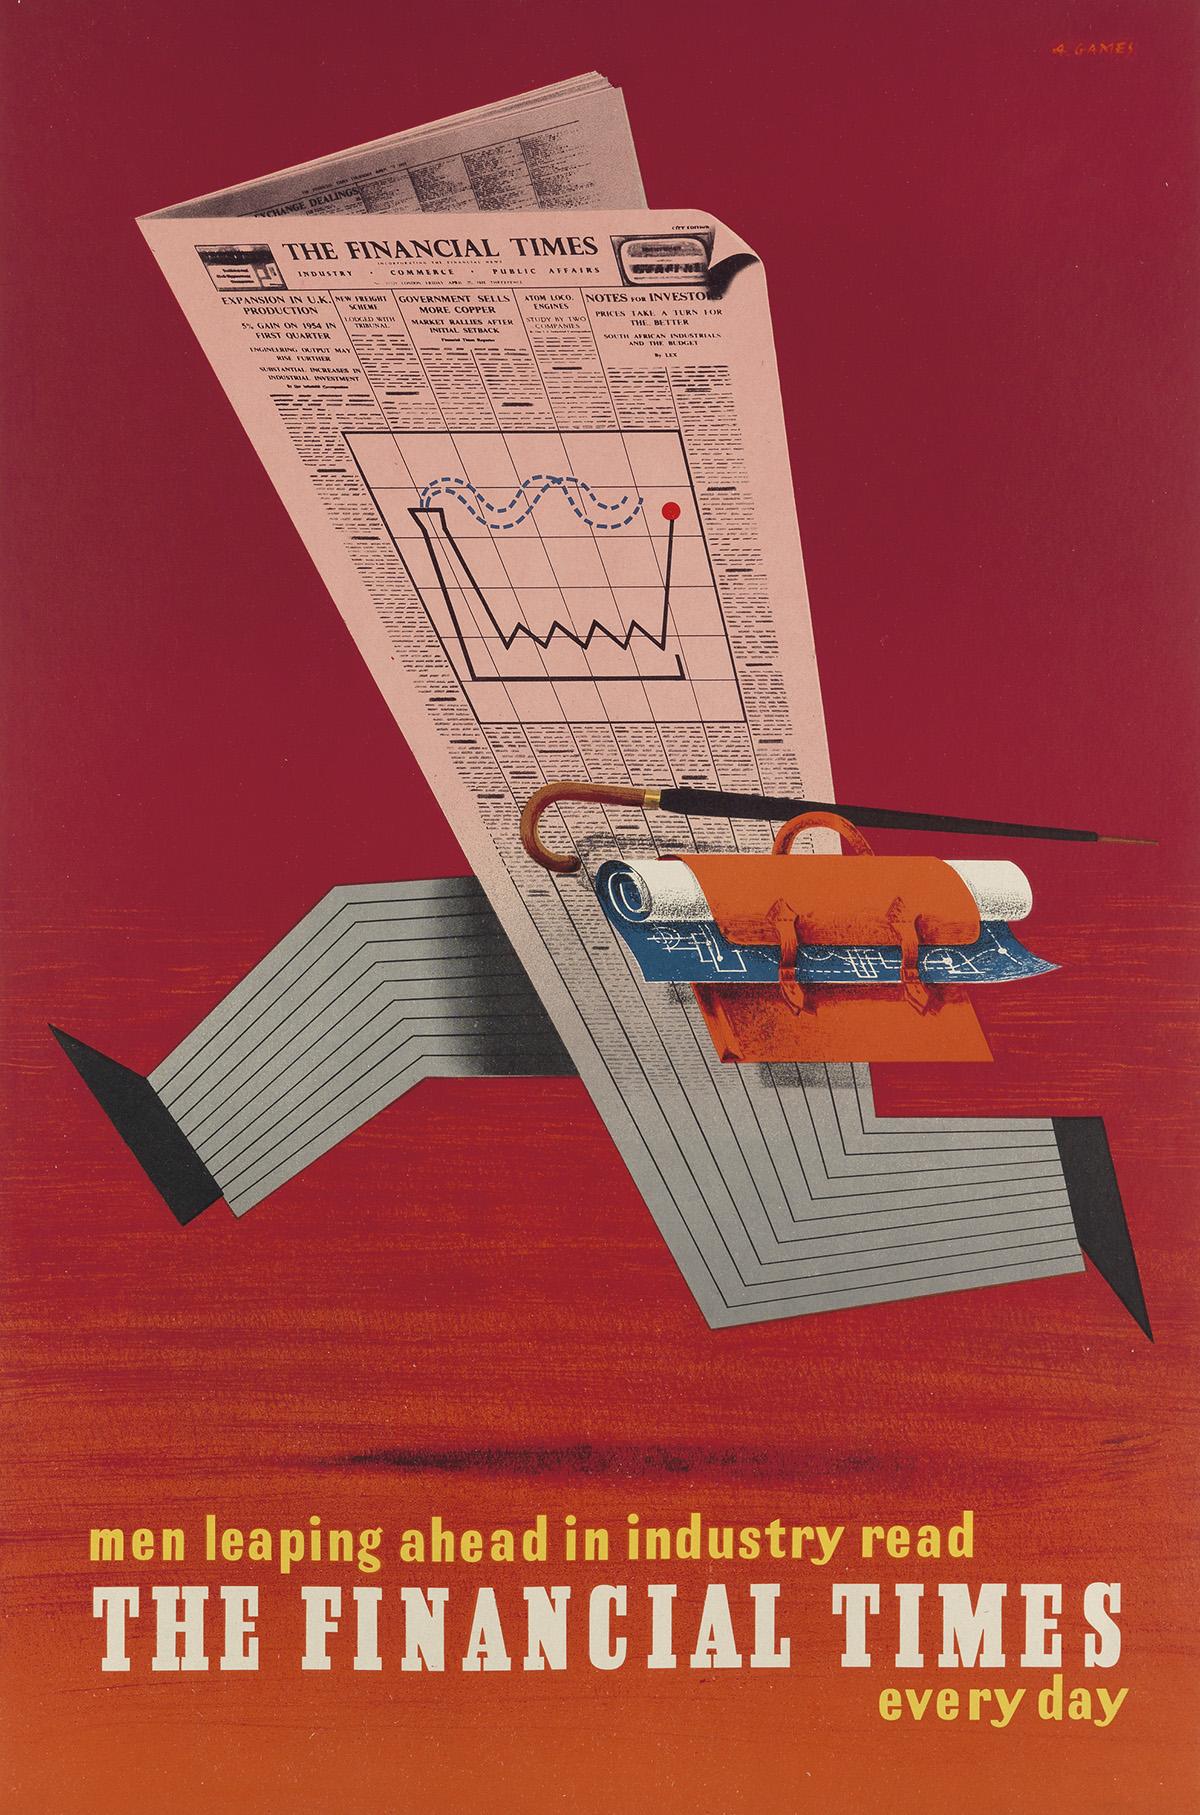 ABRAM-GAMES-(1914-1996)-MEN-LEAPING-AHEAD-IN-INDUSTRY-READ-T